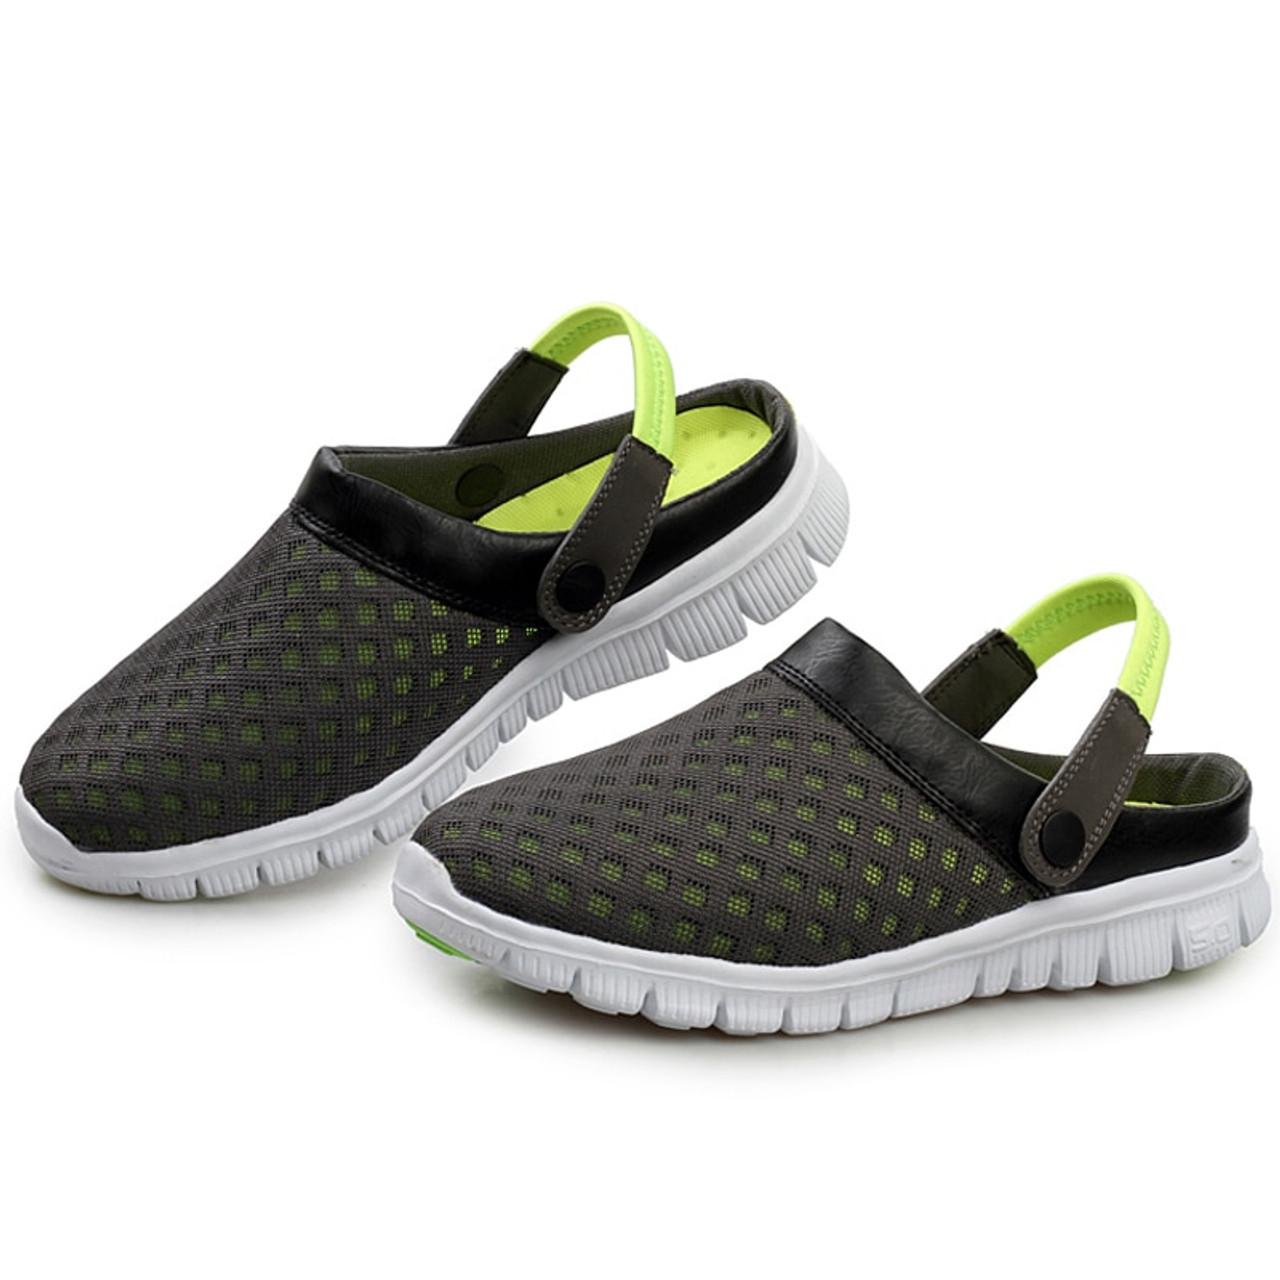 Saguaro Mesh Fashion Summer Men Slippers Shoes 2018 Unisex OXPiuTlwZk